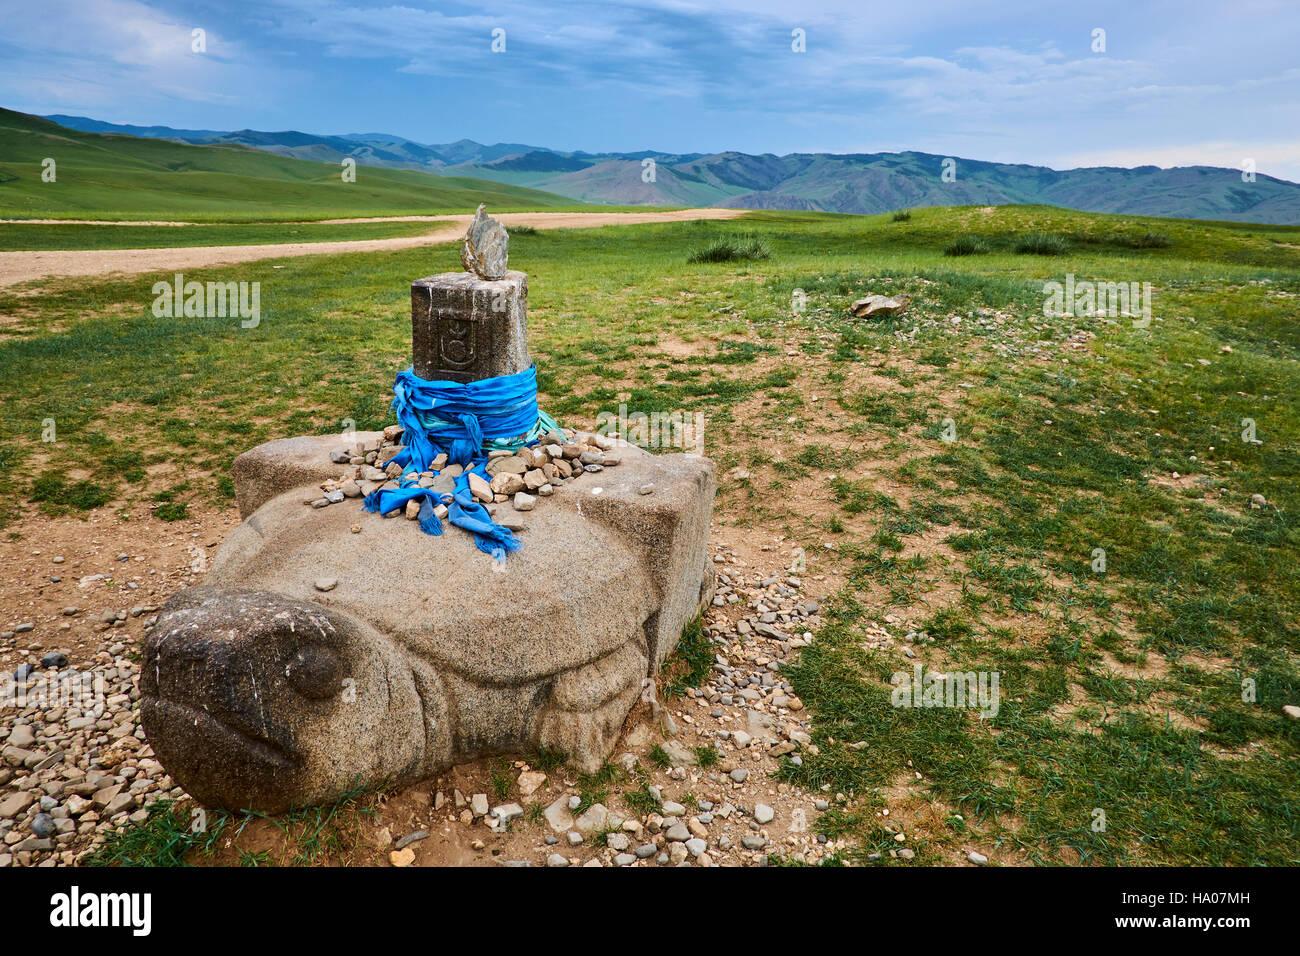 La Mongolie, l'Övörkhangaï, Kharkhorin, vallée de l'Orkhon, Unesco world heritage, tortue Photo Stock